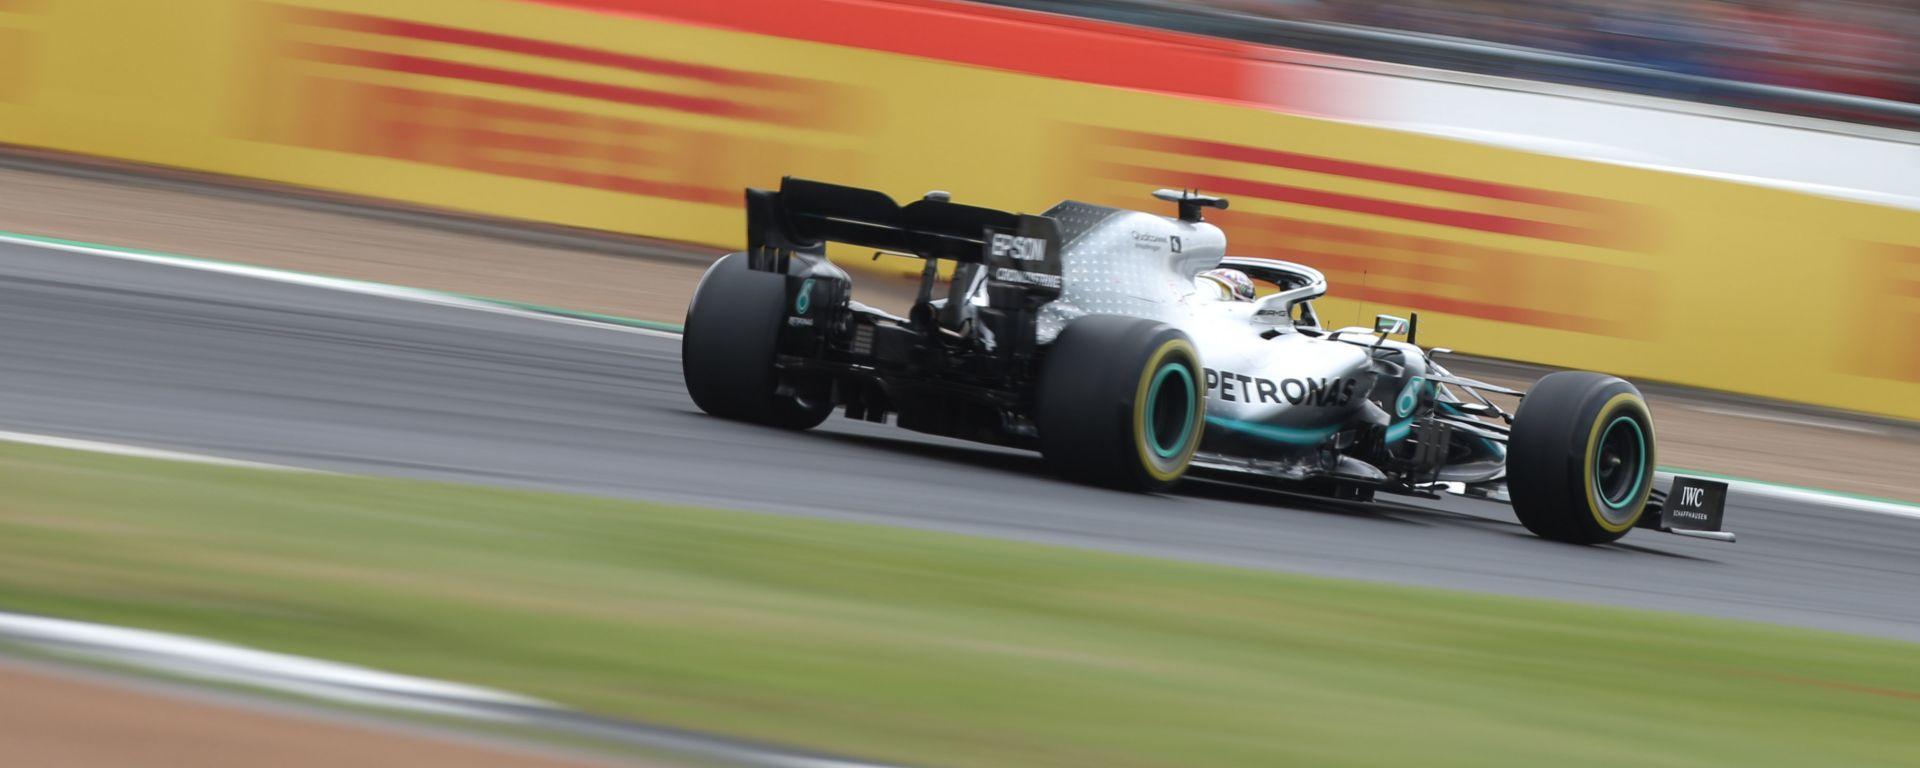 F1 GP Gran Bretagna 2019, Lewis Hamilton (Mercedes) trionfa a Silverstone